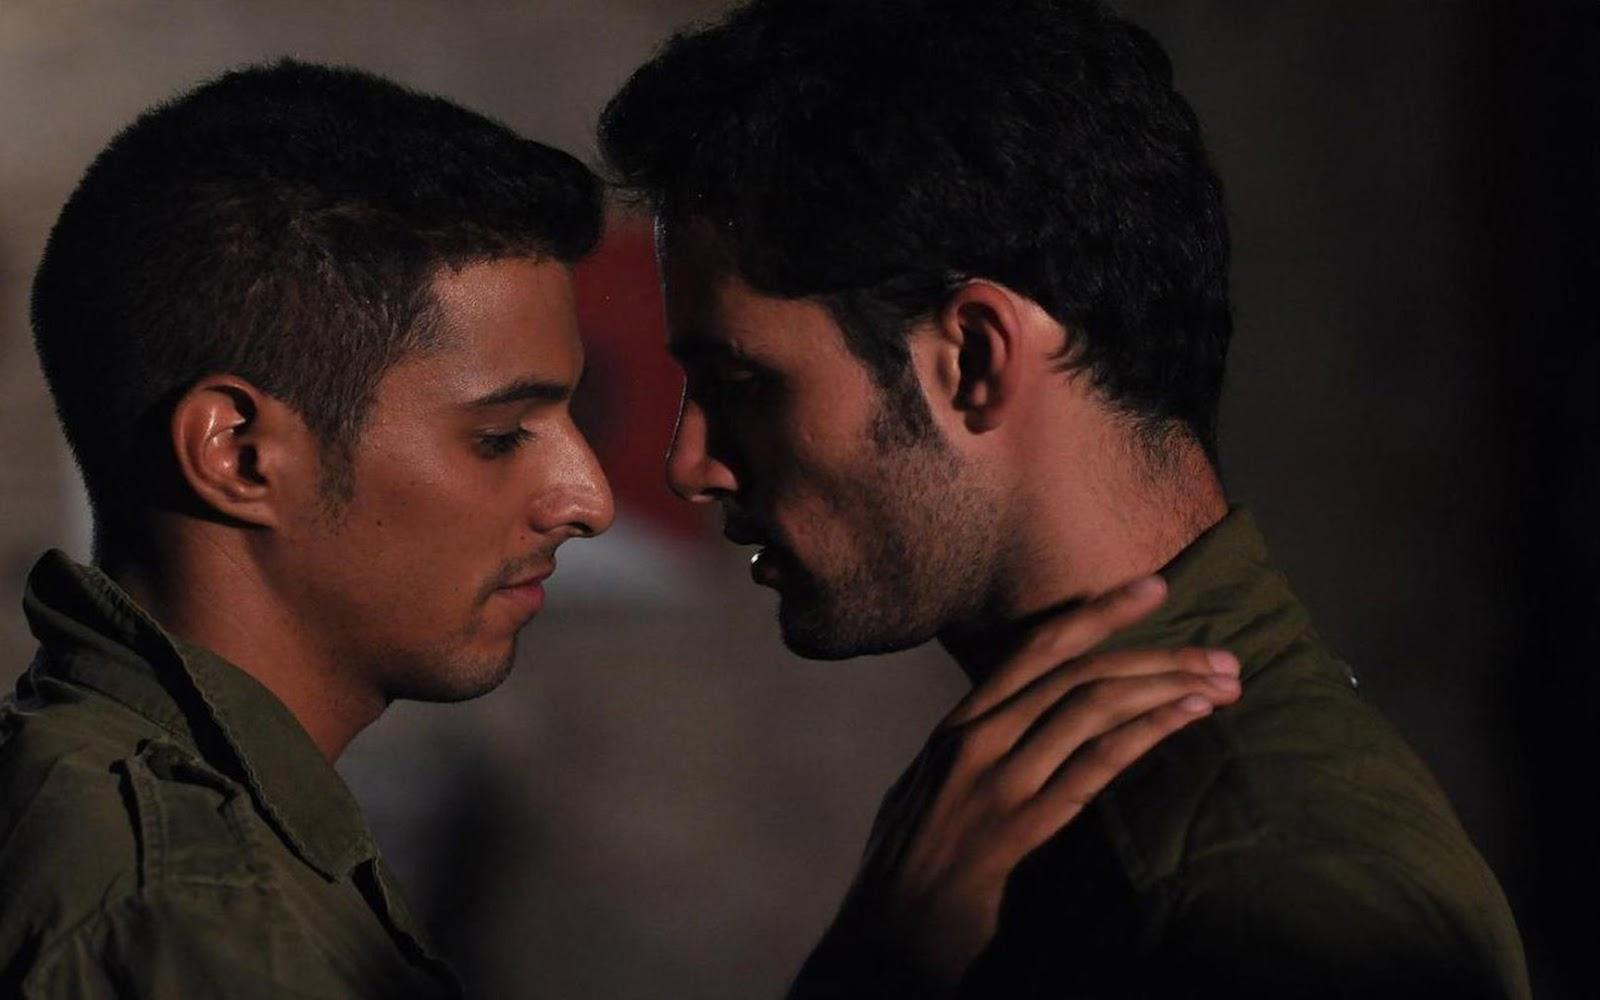 Israel Gay Scene 42